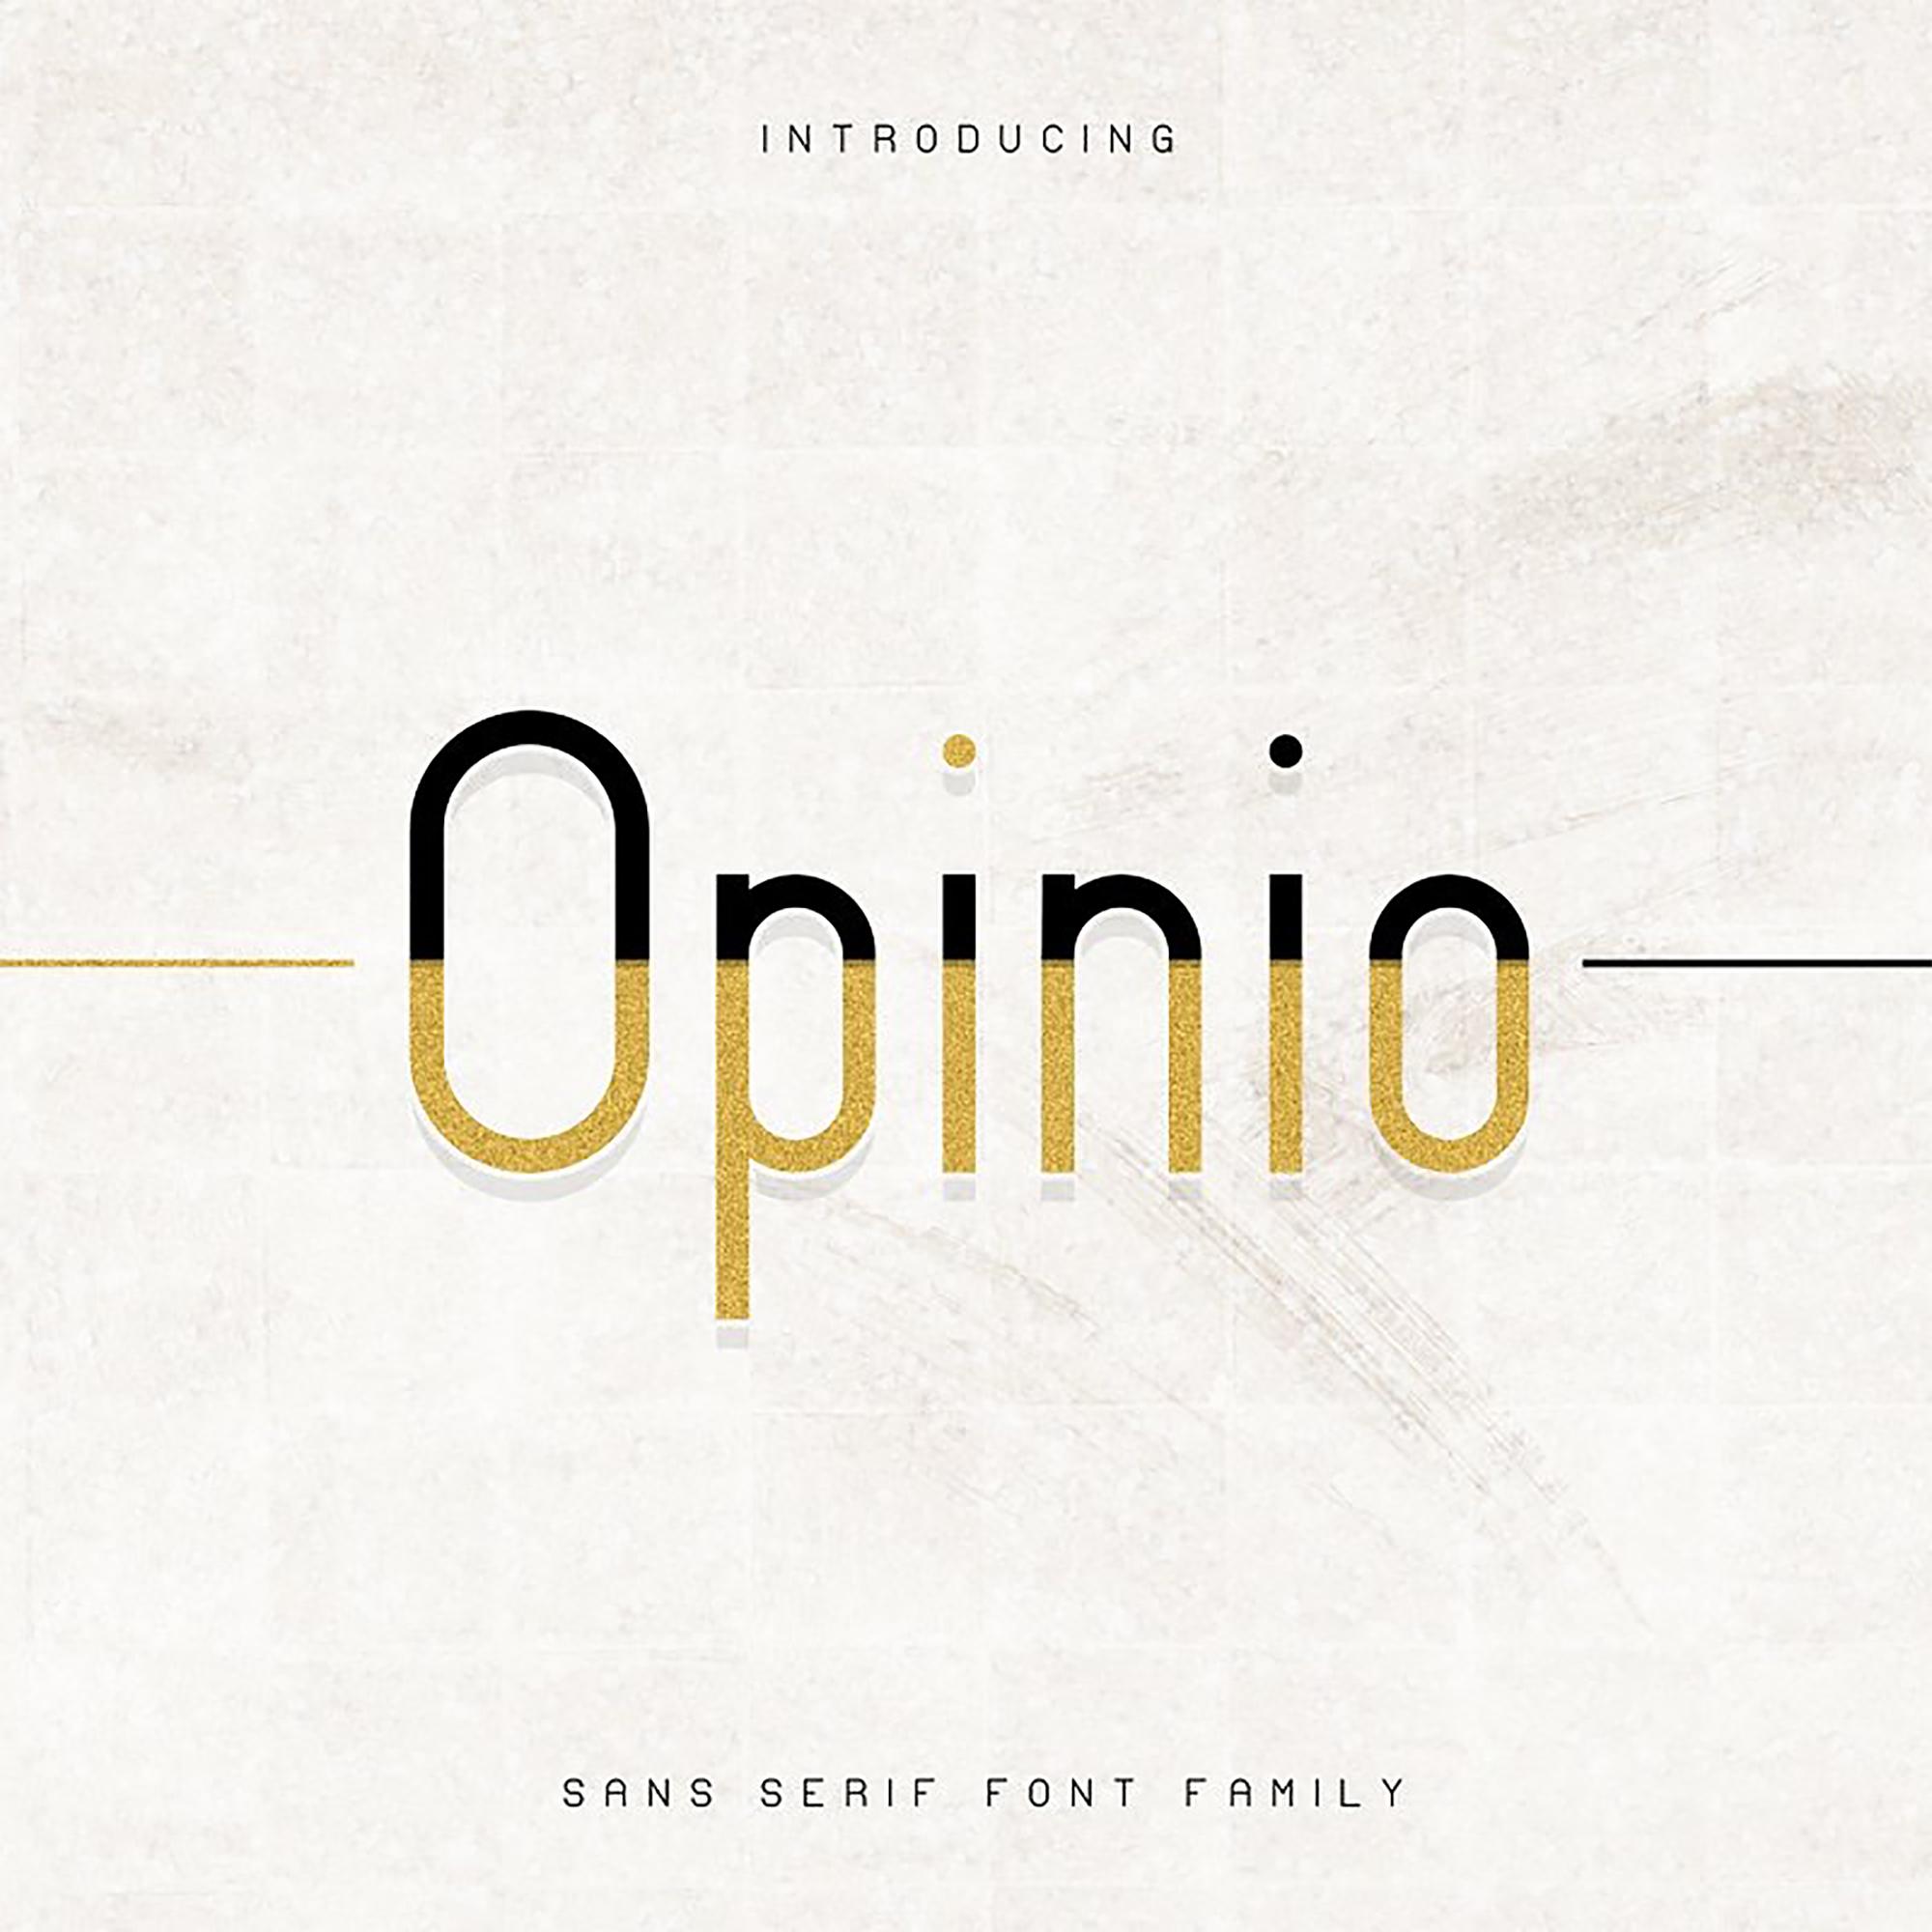 Copperplate Sans Serif